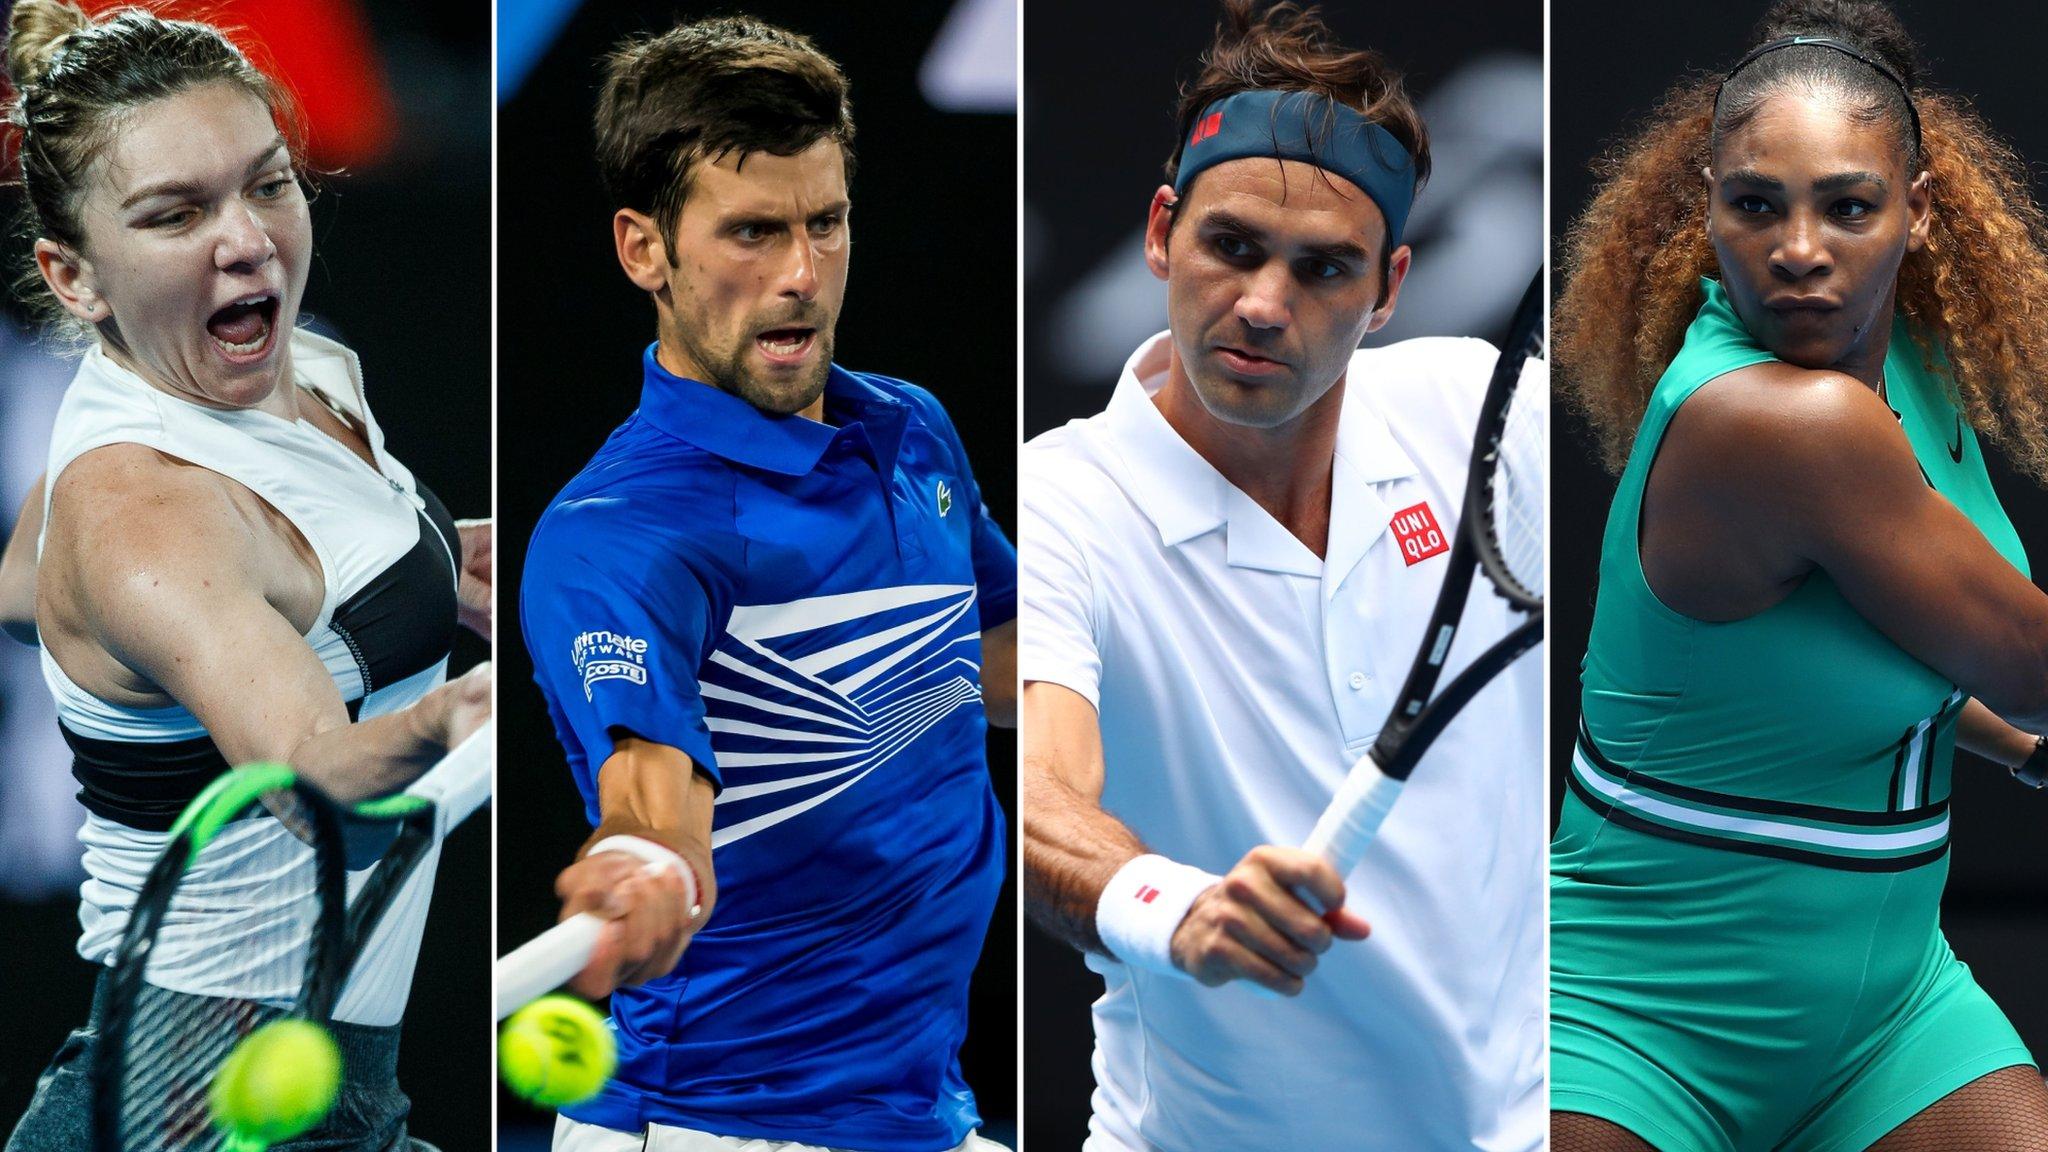 Australian Open: BBC TV & radio coverage details